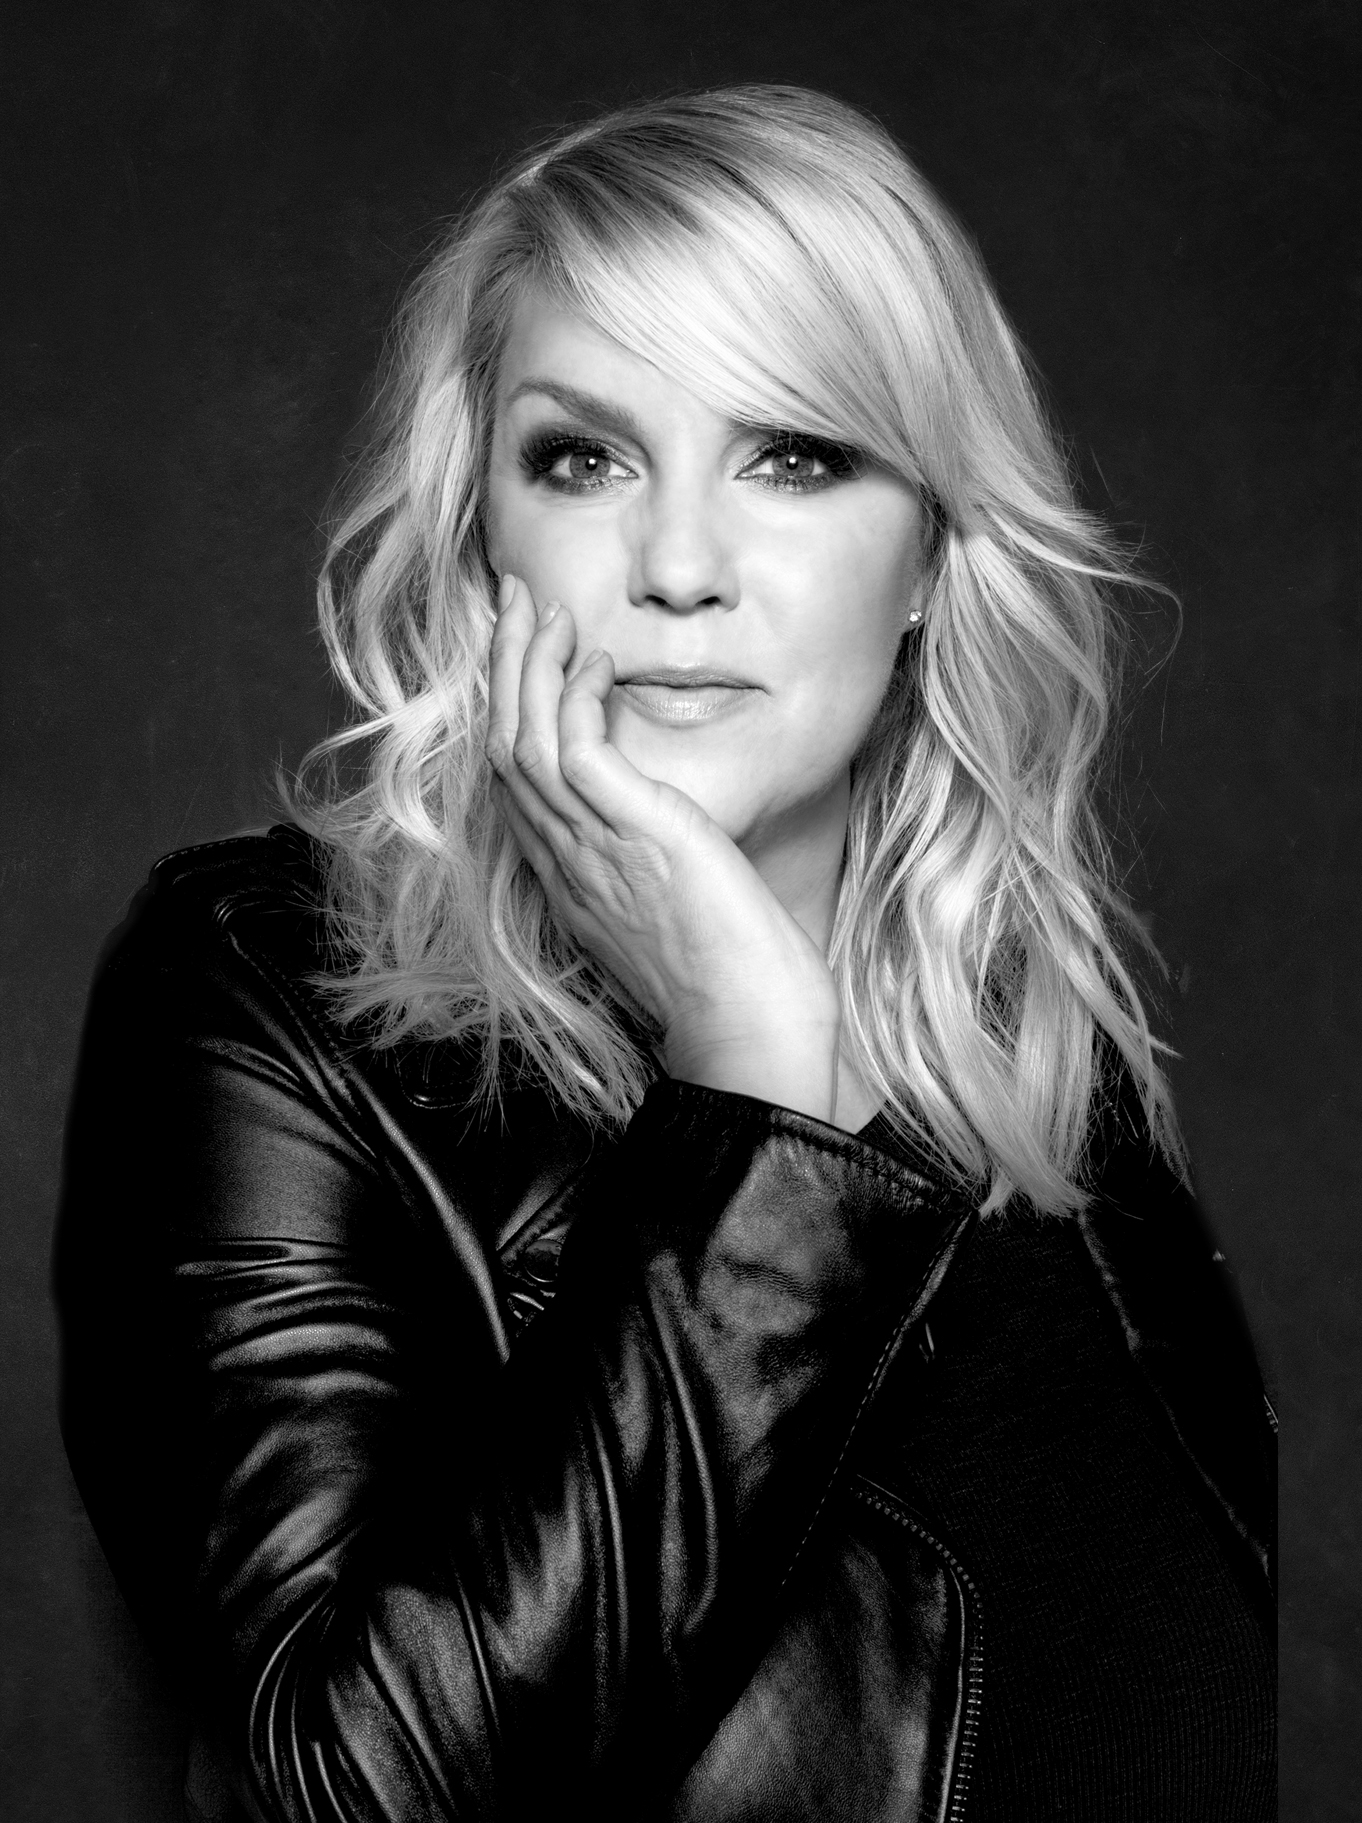 Award-winning musician Nicole Nordeman will join us at this year's gala.